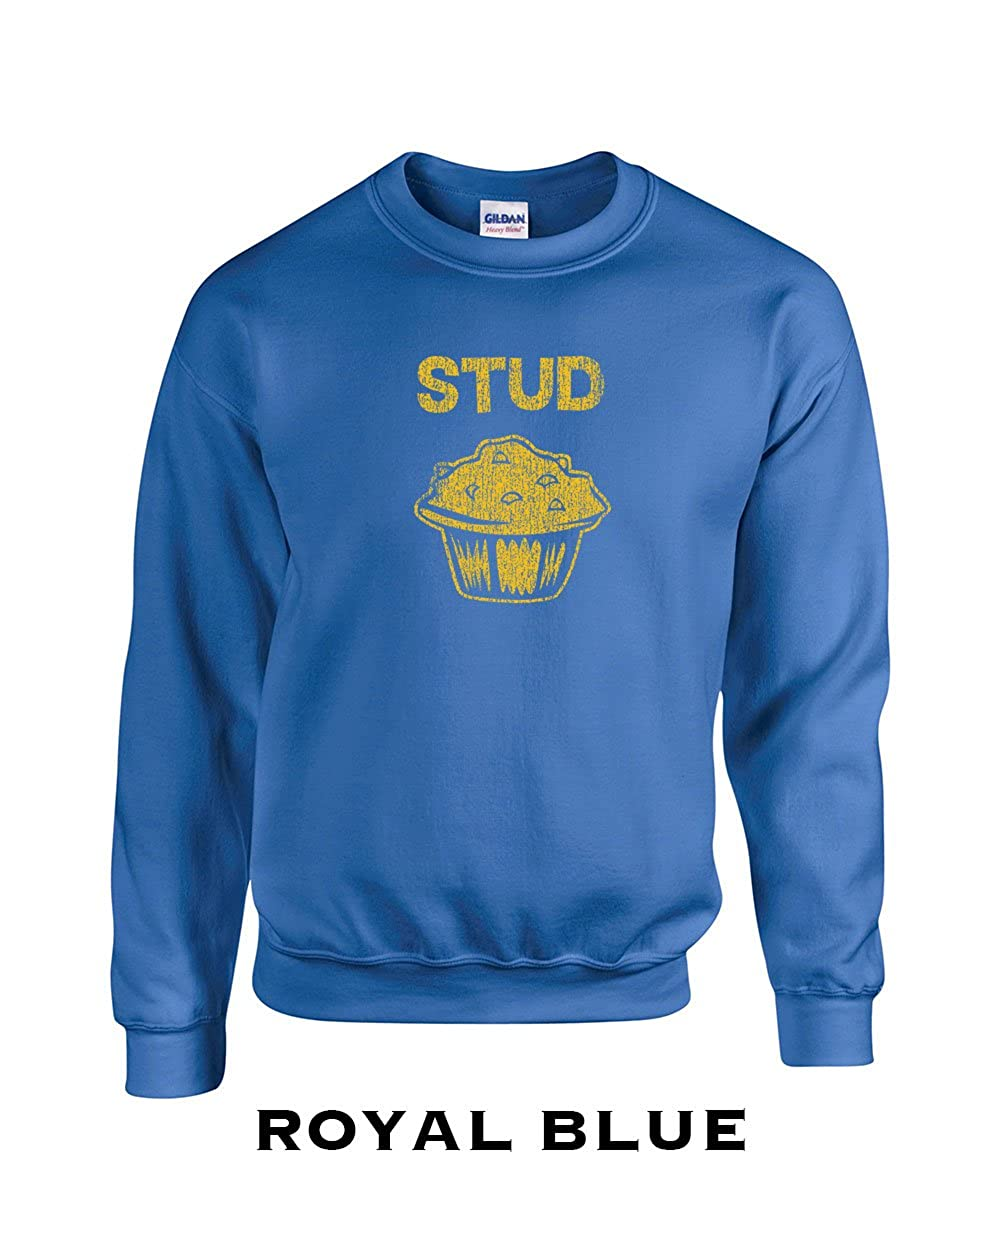 Swaffy Tees 144 Stud Muffin Funny Adult Crew Sweatshirt